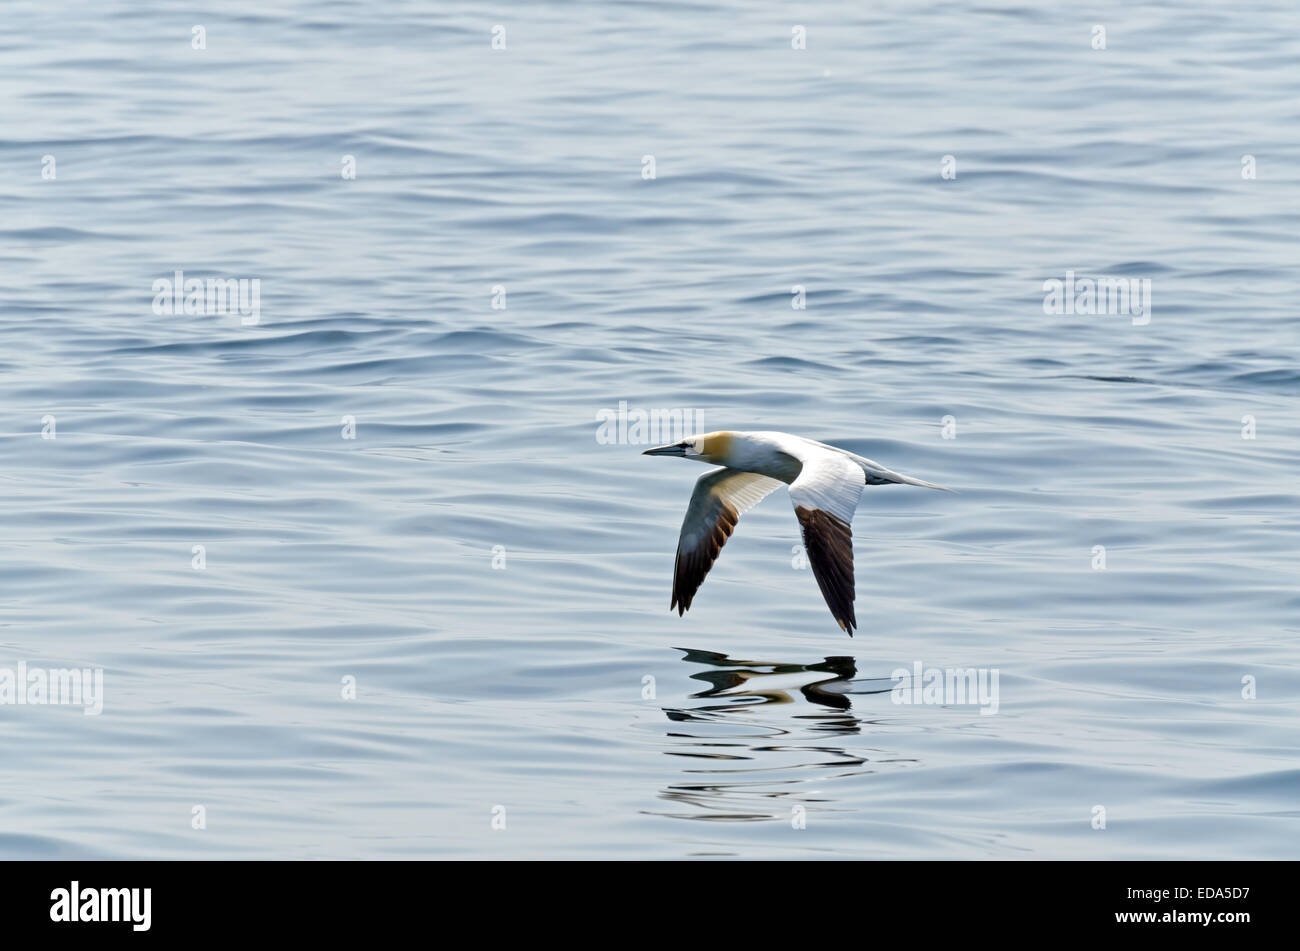 Northern gannet in volo sopra l'oceano Foto Stock